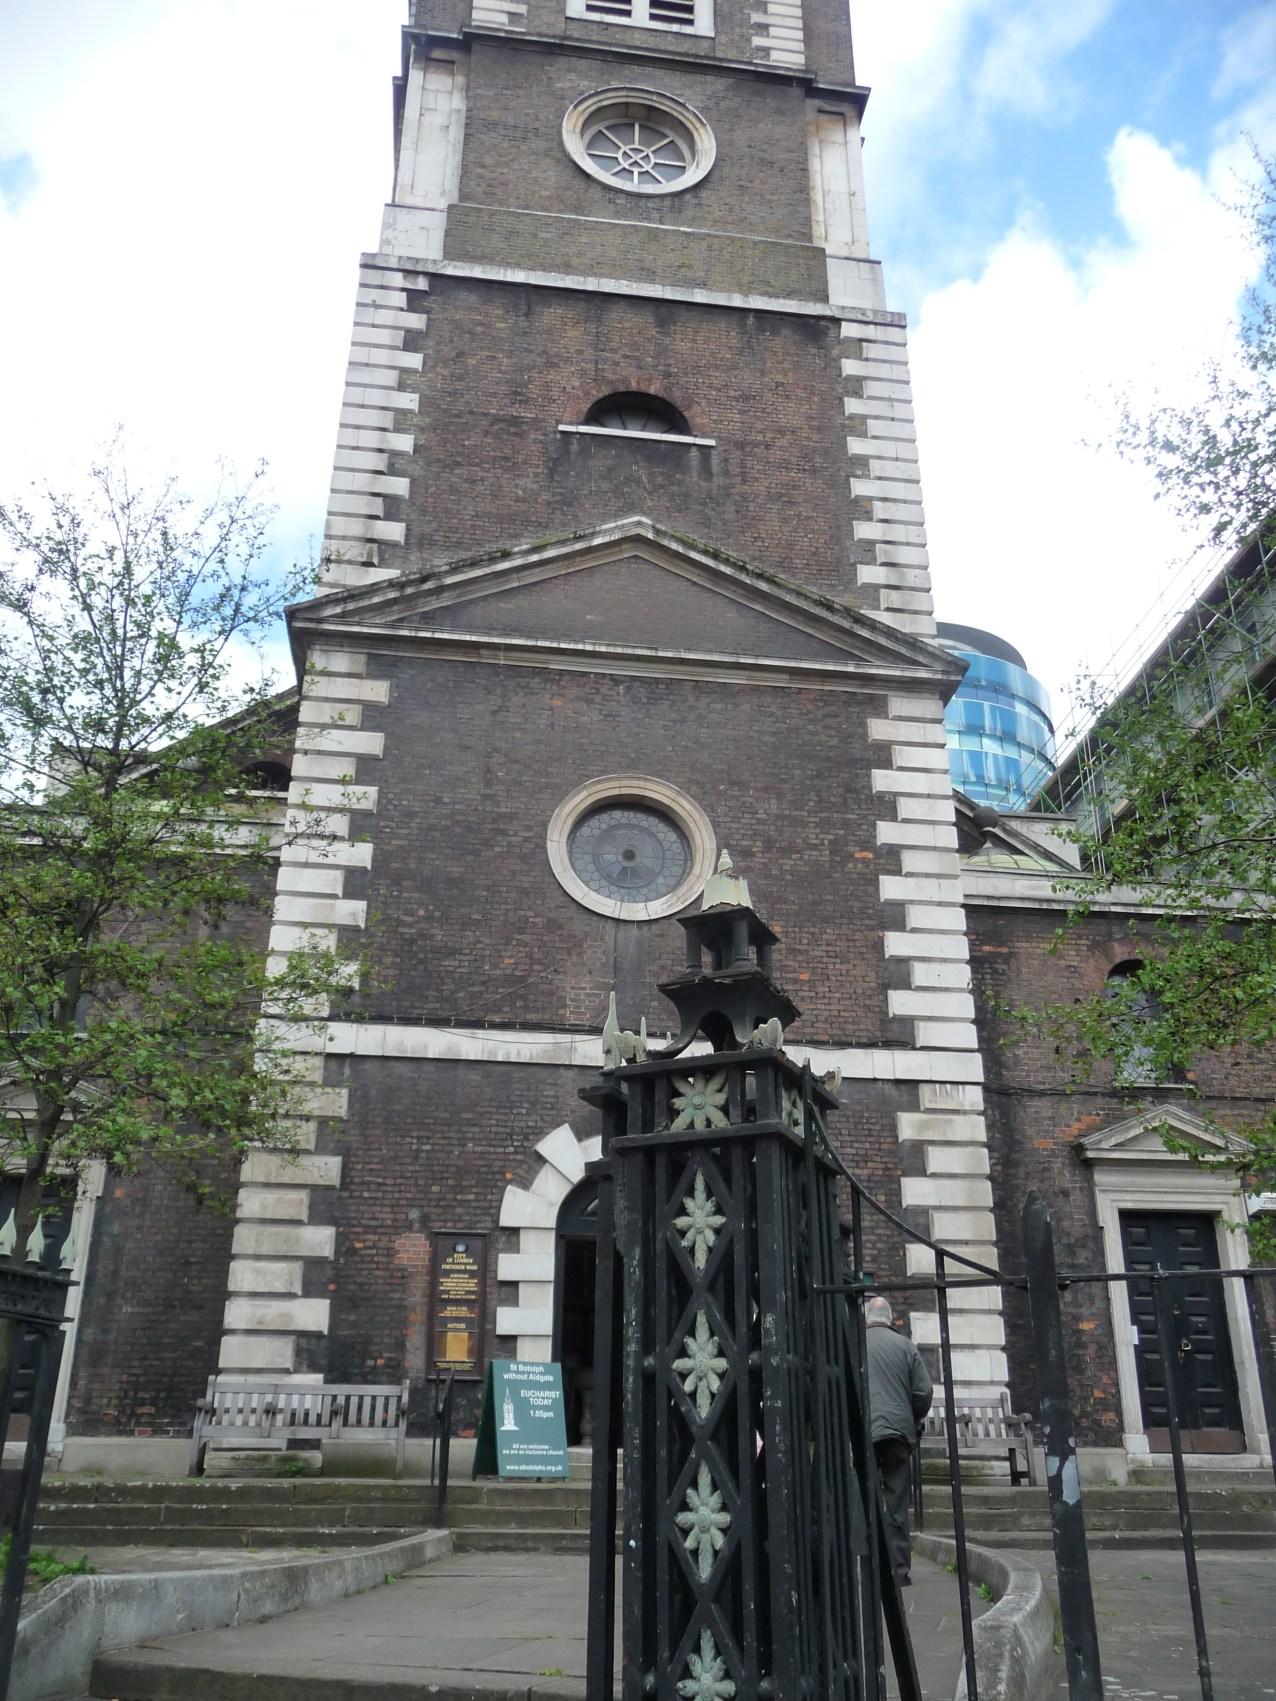 Outside St Botolph's Aldgate